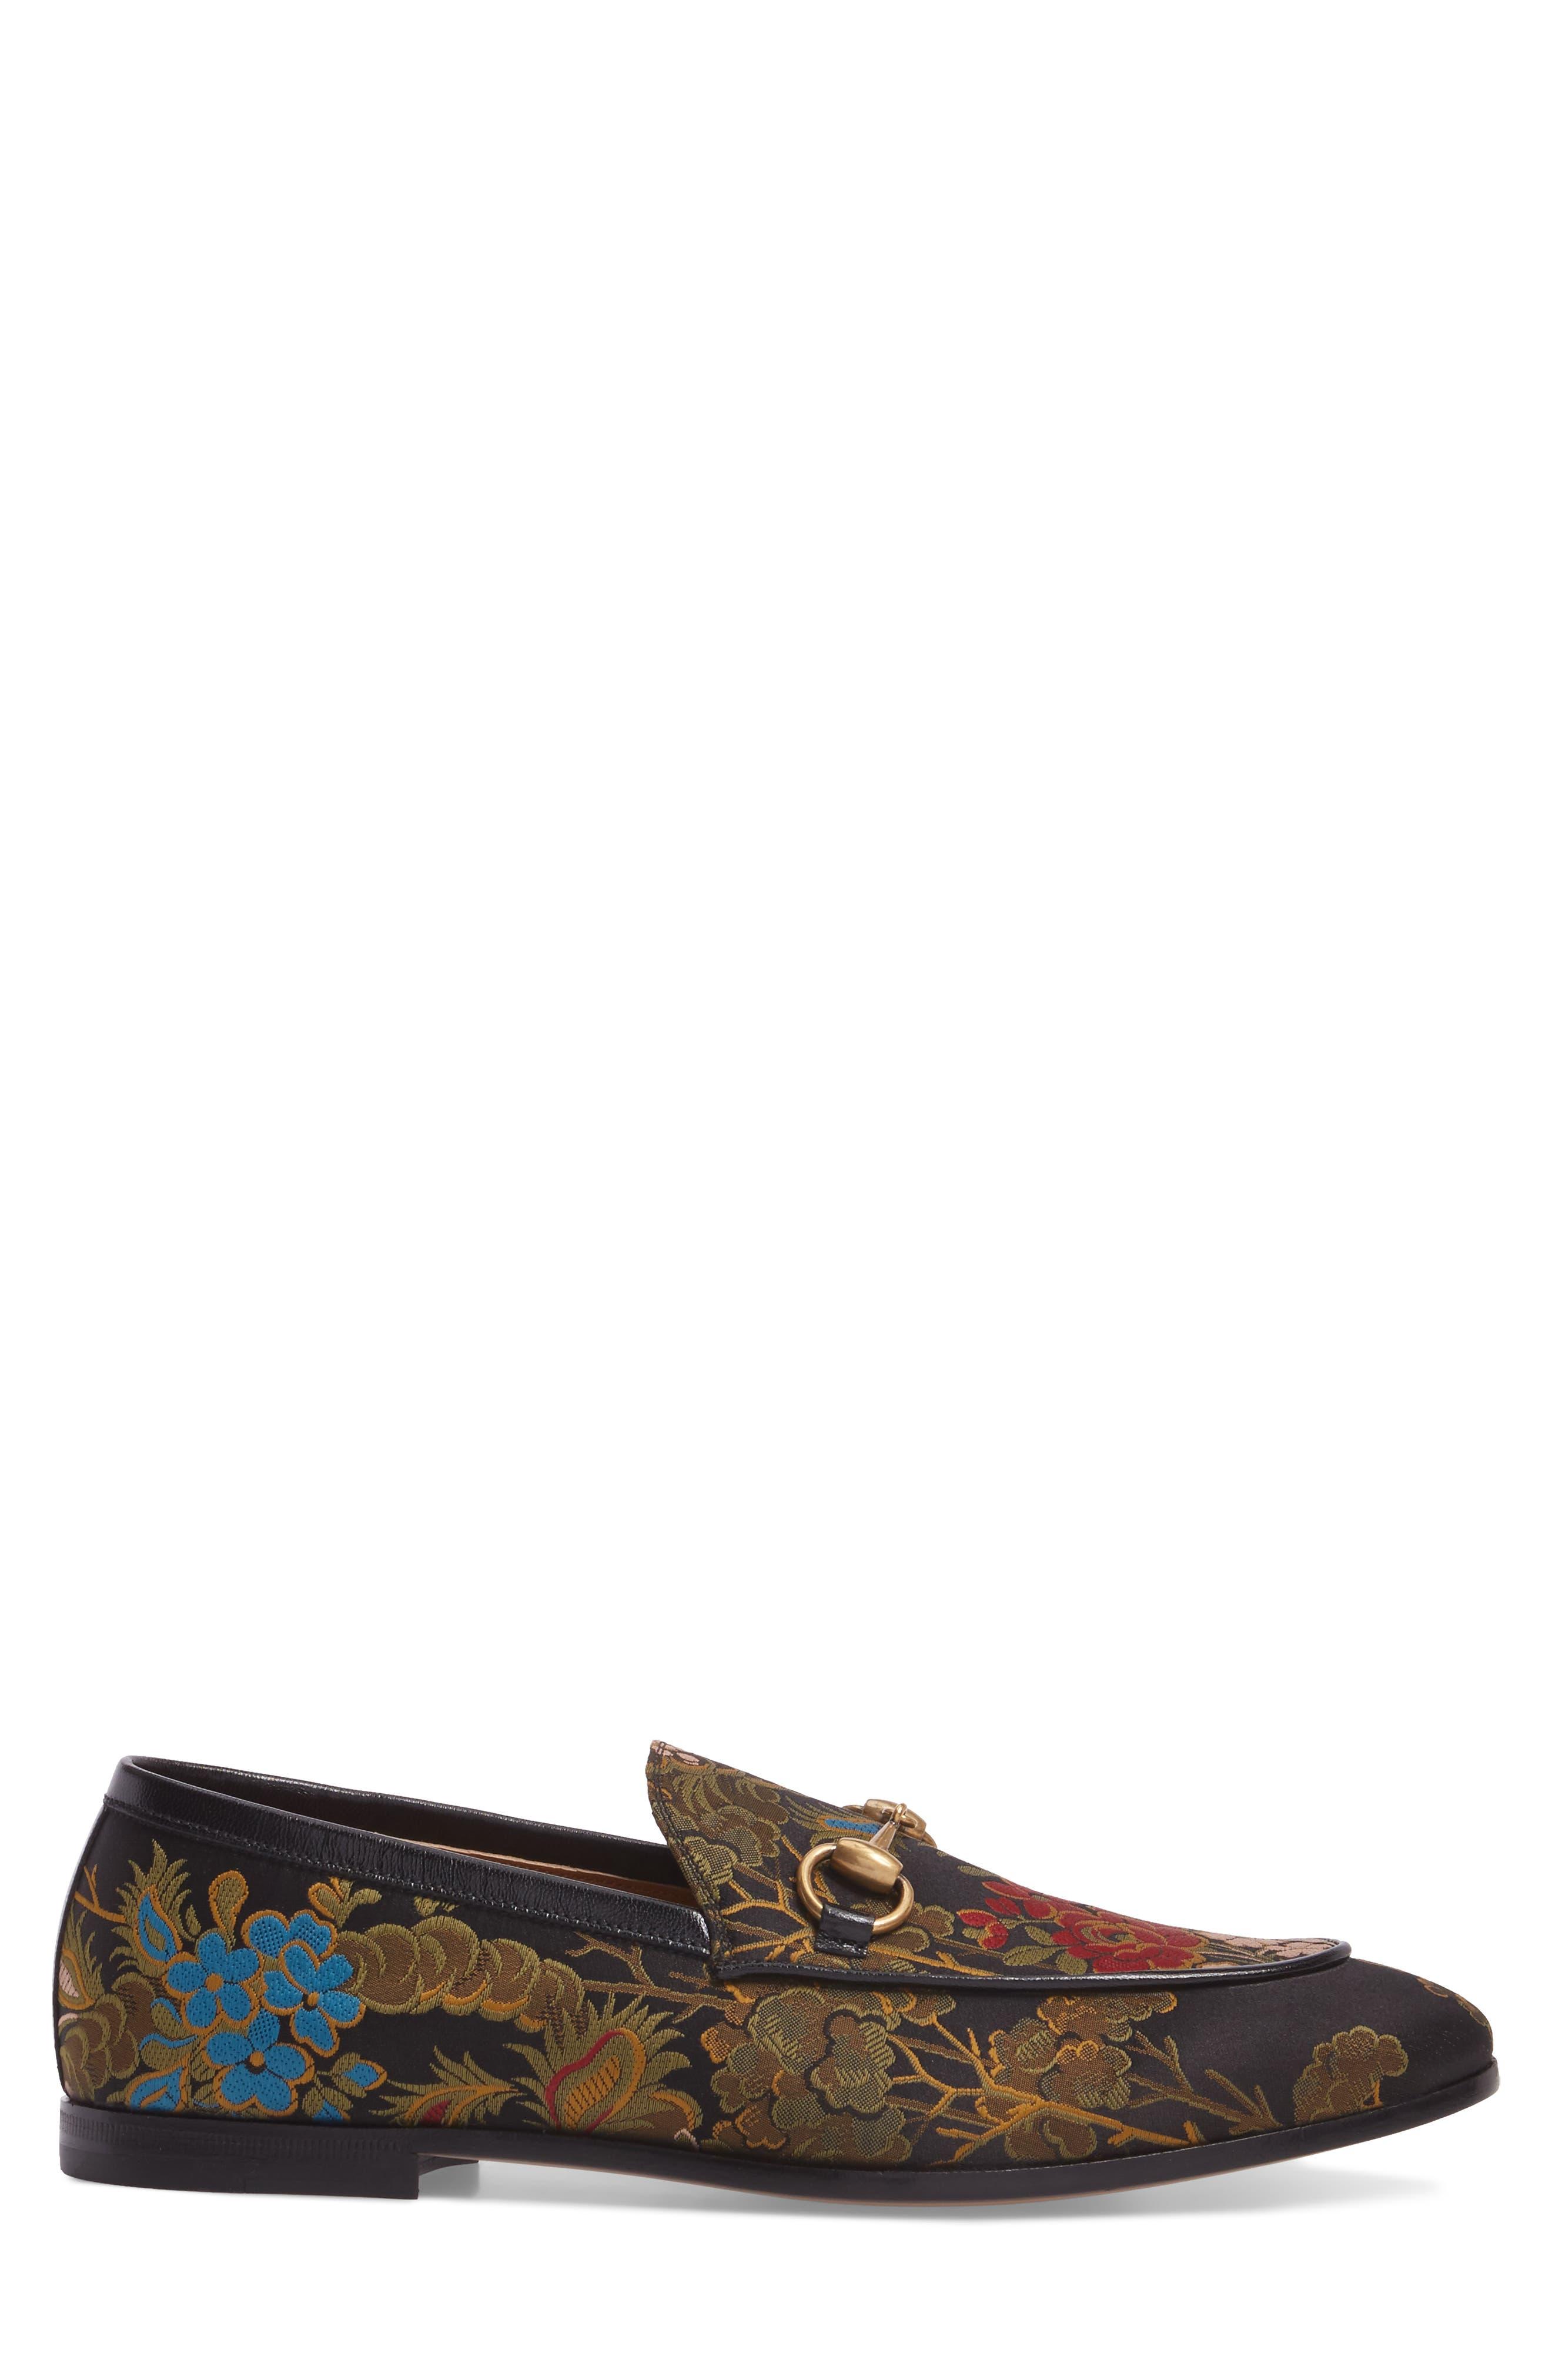 Alternate Image 3  - Gucci Jordaan Jacquard Bit Loafer (Men)